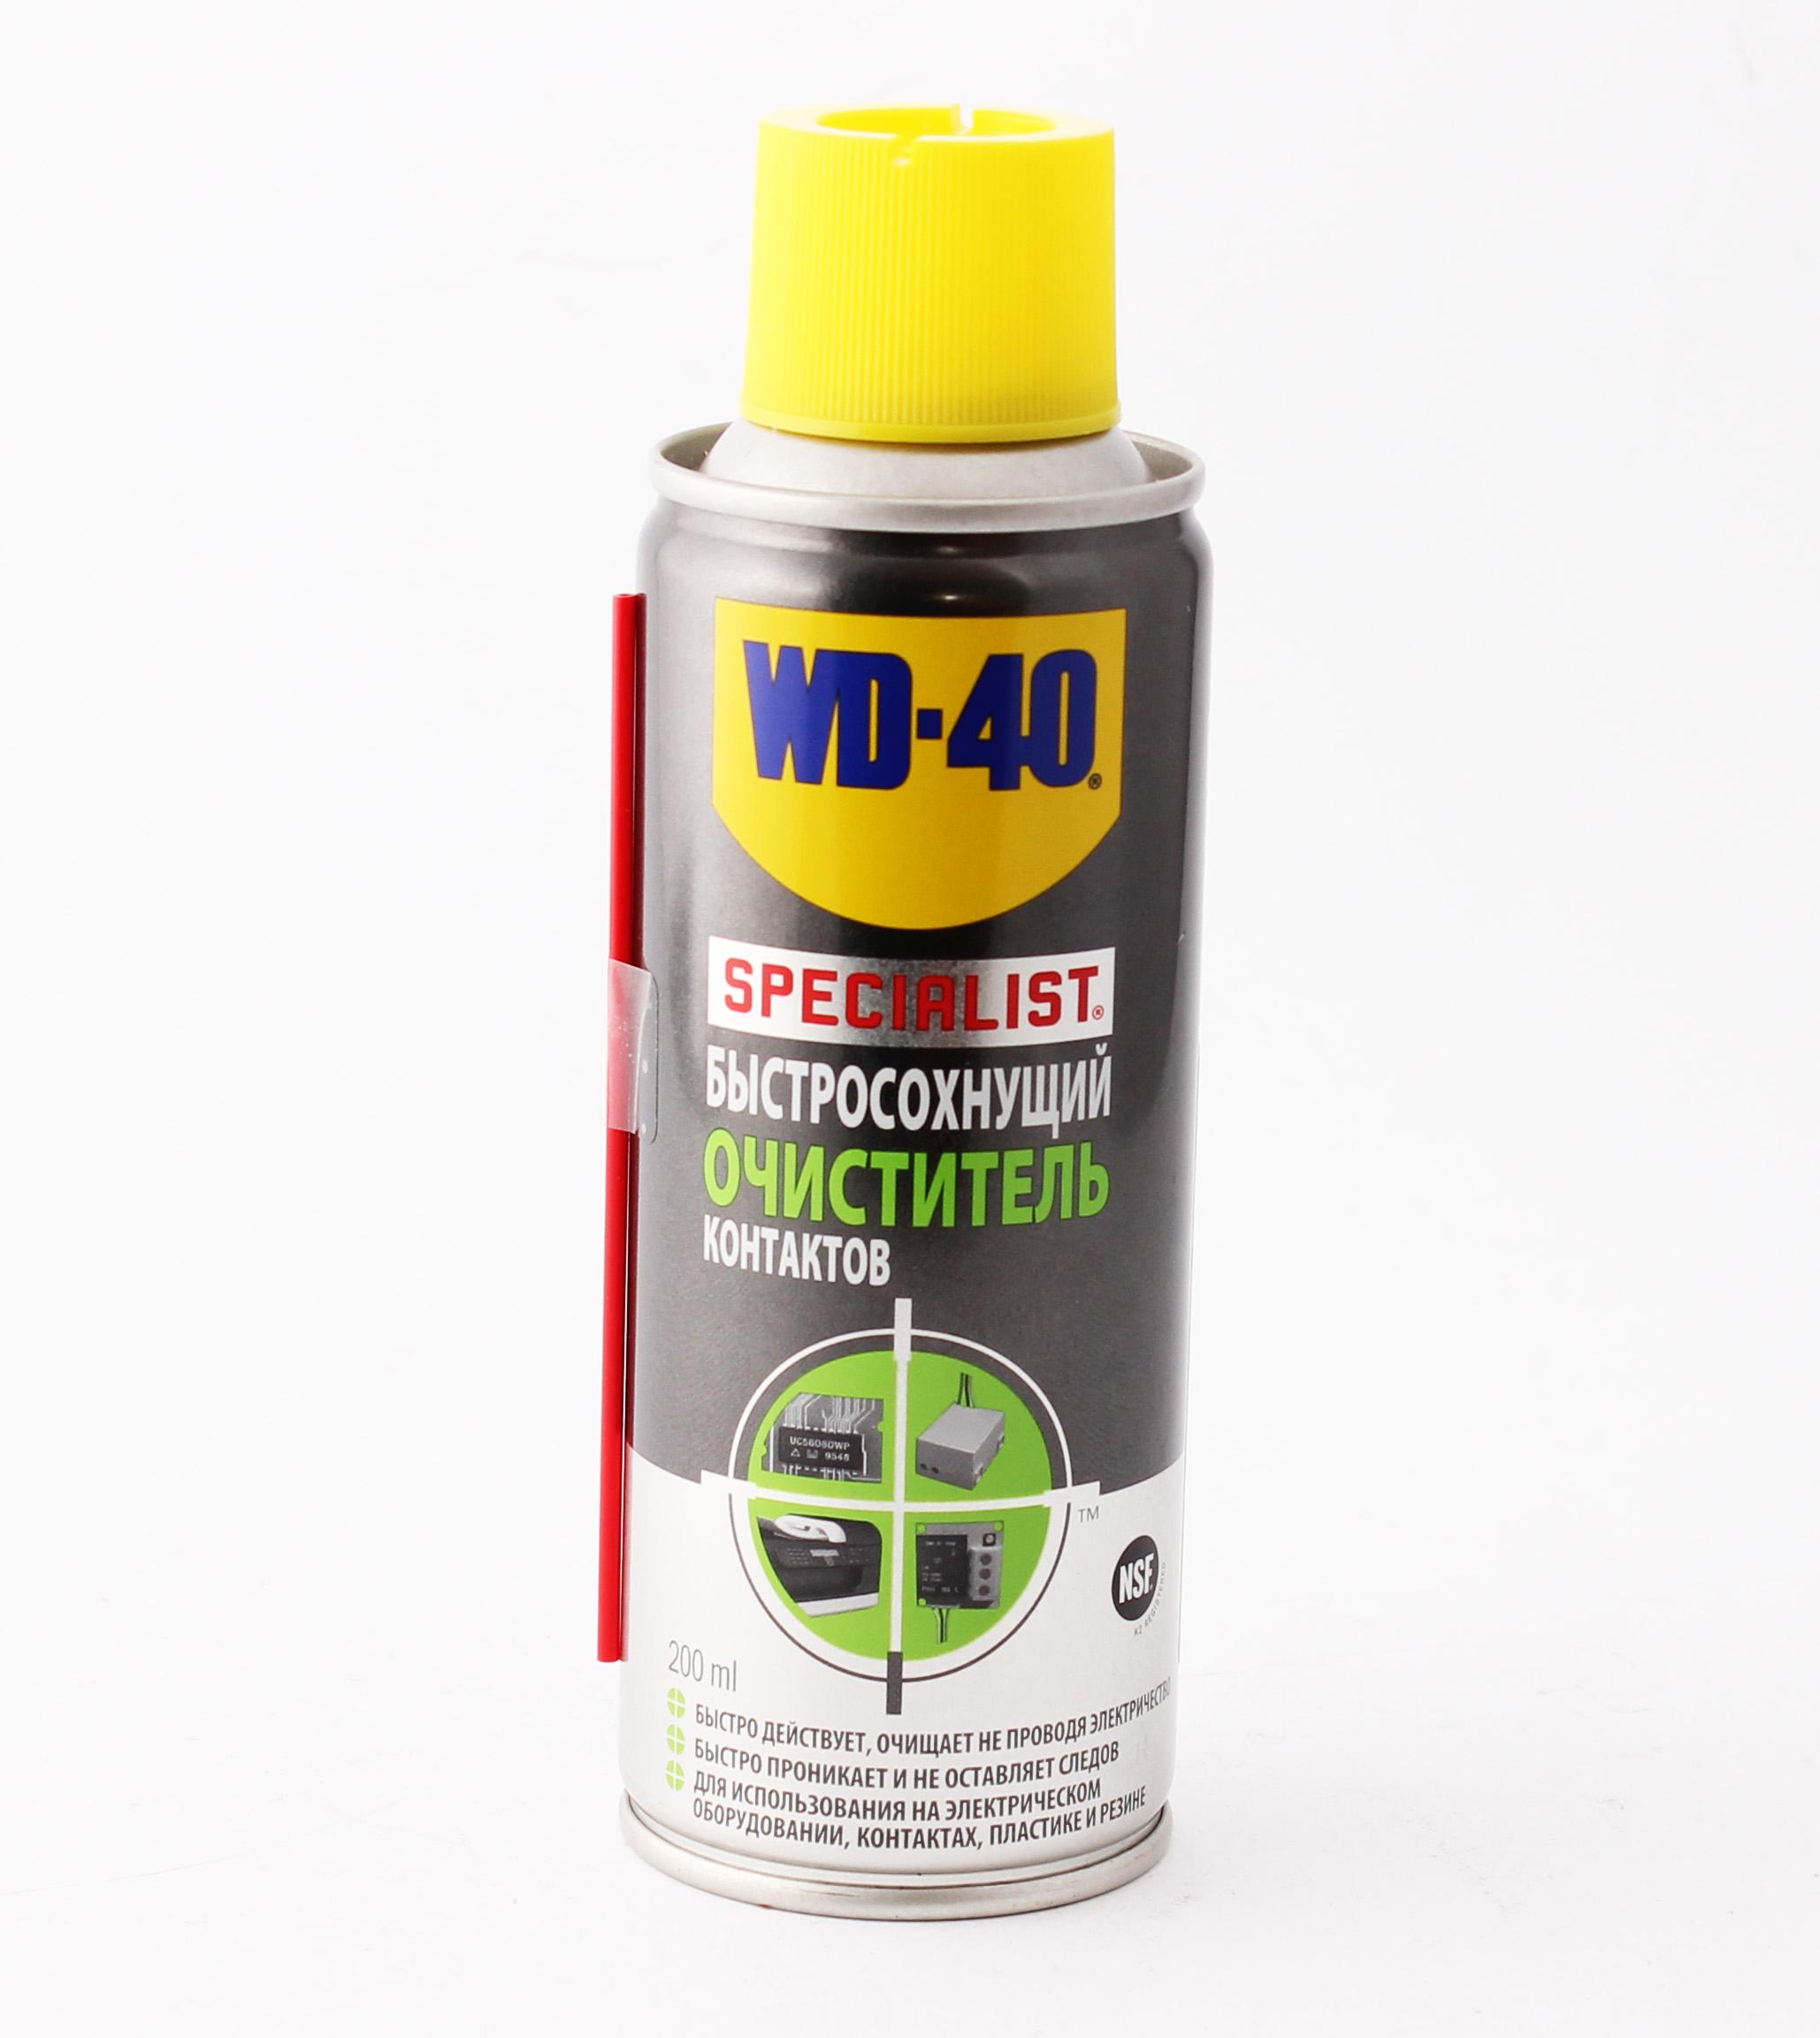 WD-40 Швидковисихаючий очисник контакт. Spesialist 200мл